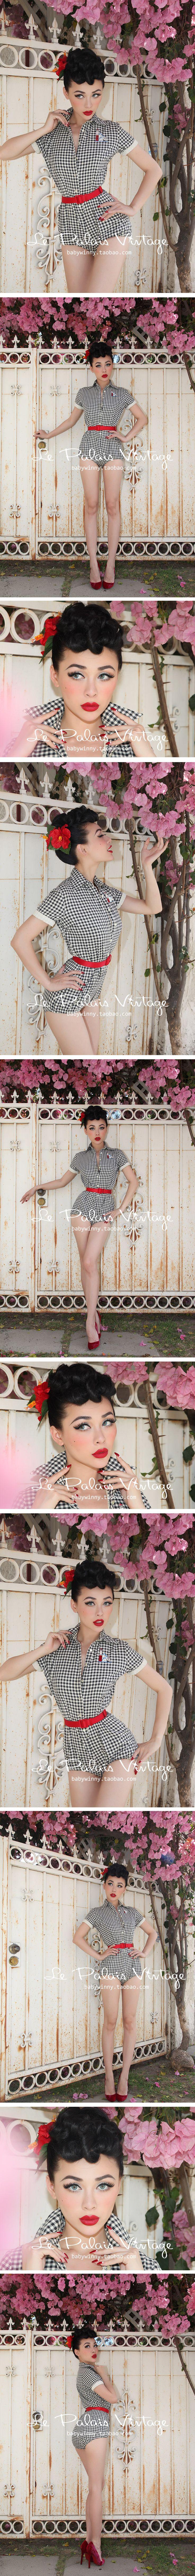 le palais vintage 复古甜美经典黑白格衬衫百搭连体裤【重0.25】-淘宝网